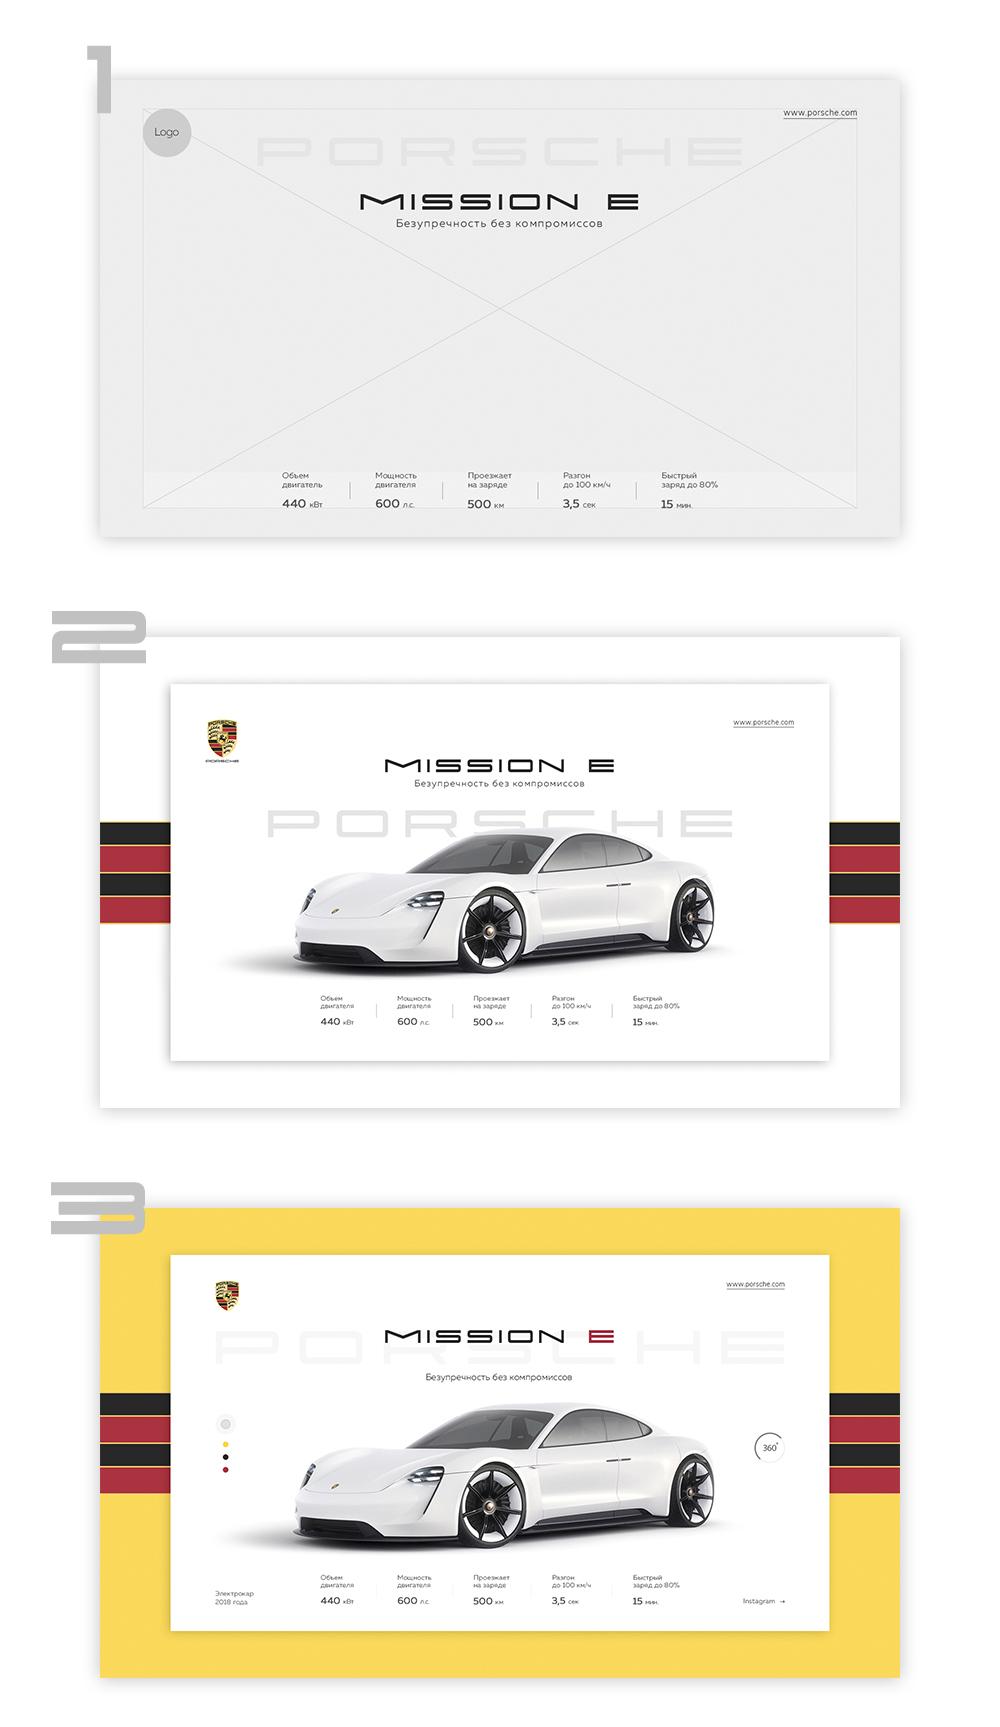 Баннер Porsche Mission E